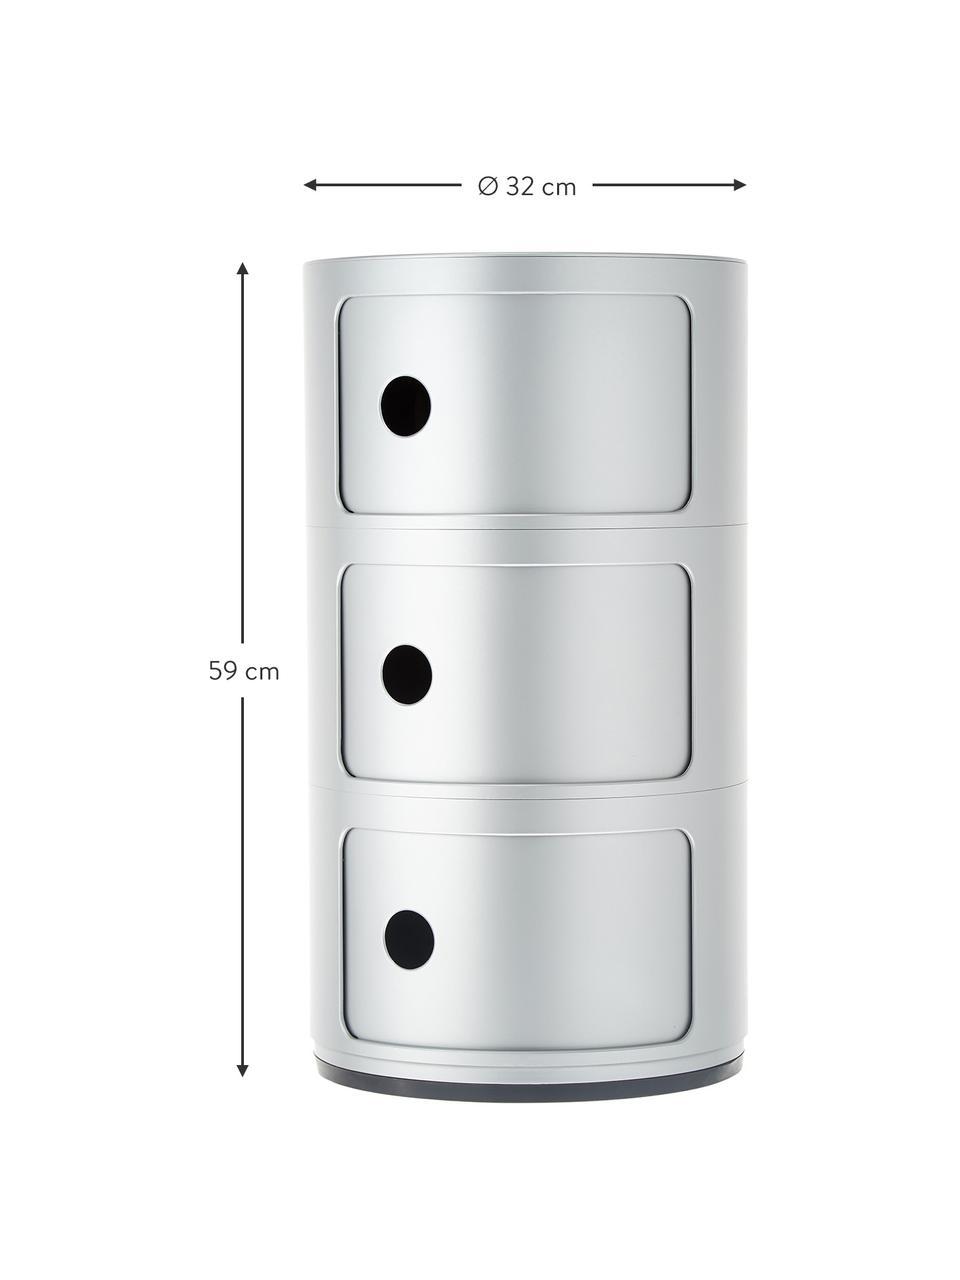 Design Container Componibili 3 Modules, Kunststoff (ABS), lackiert, Silberfarben, Ø 32 x H 59 cm